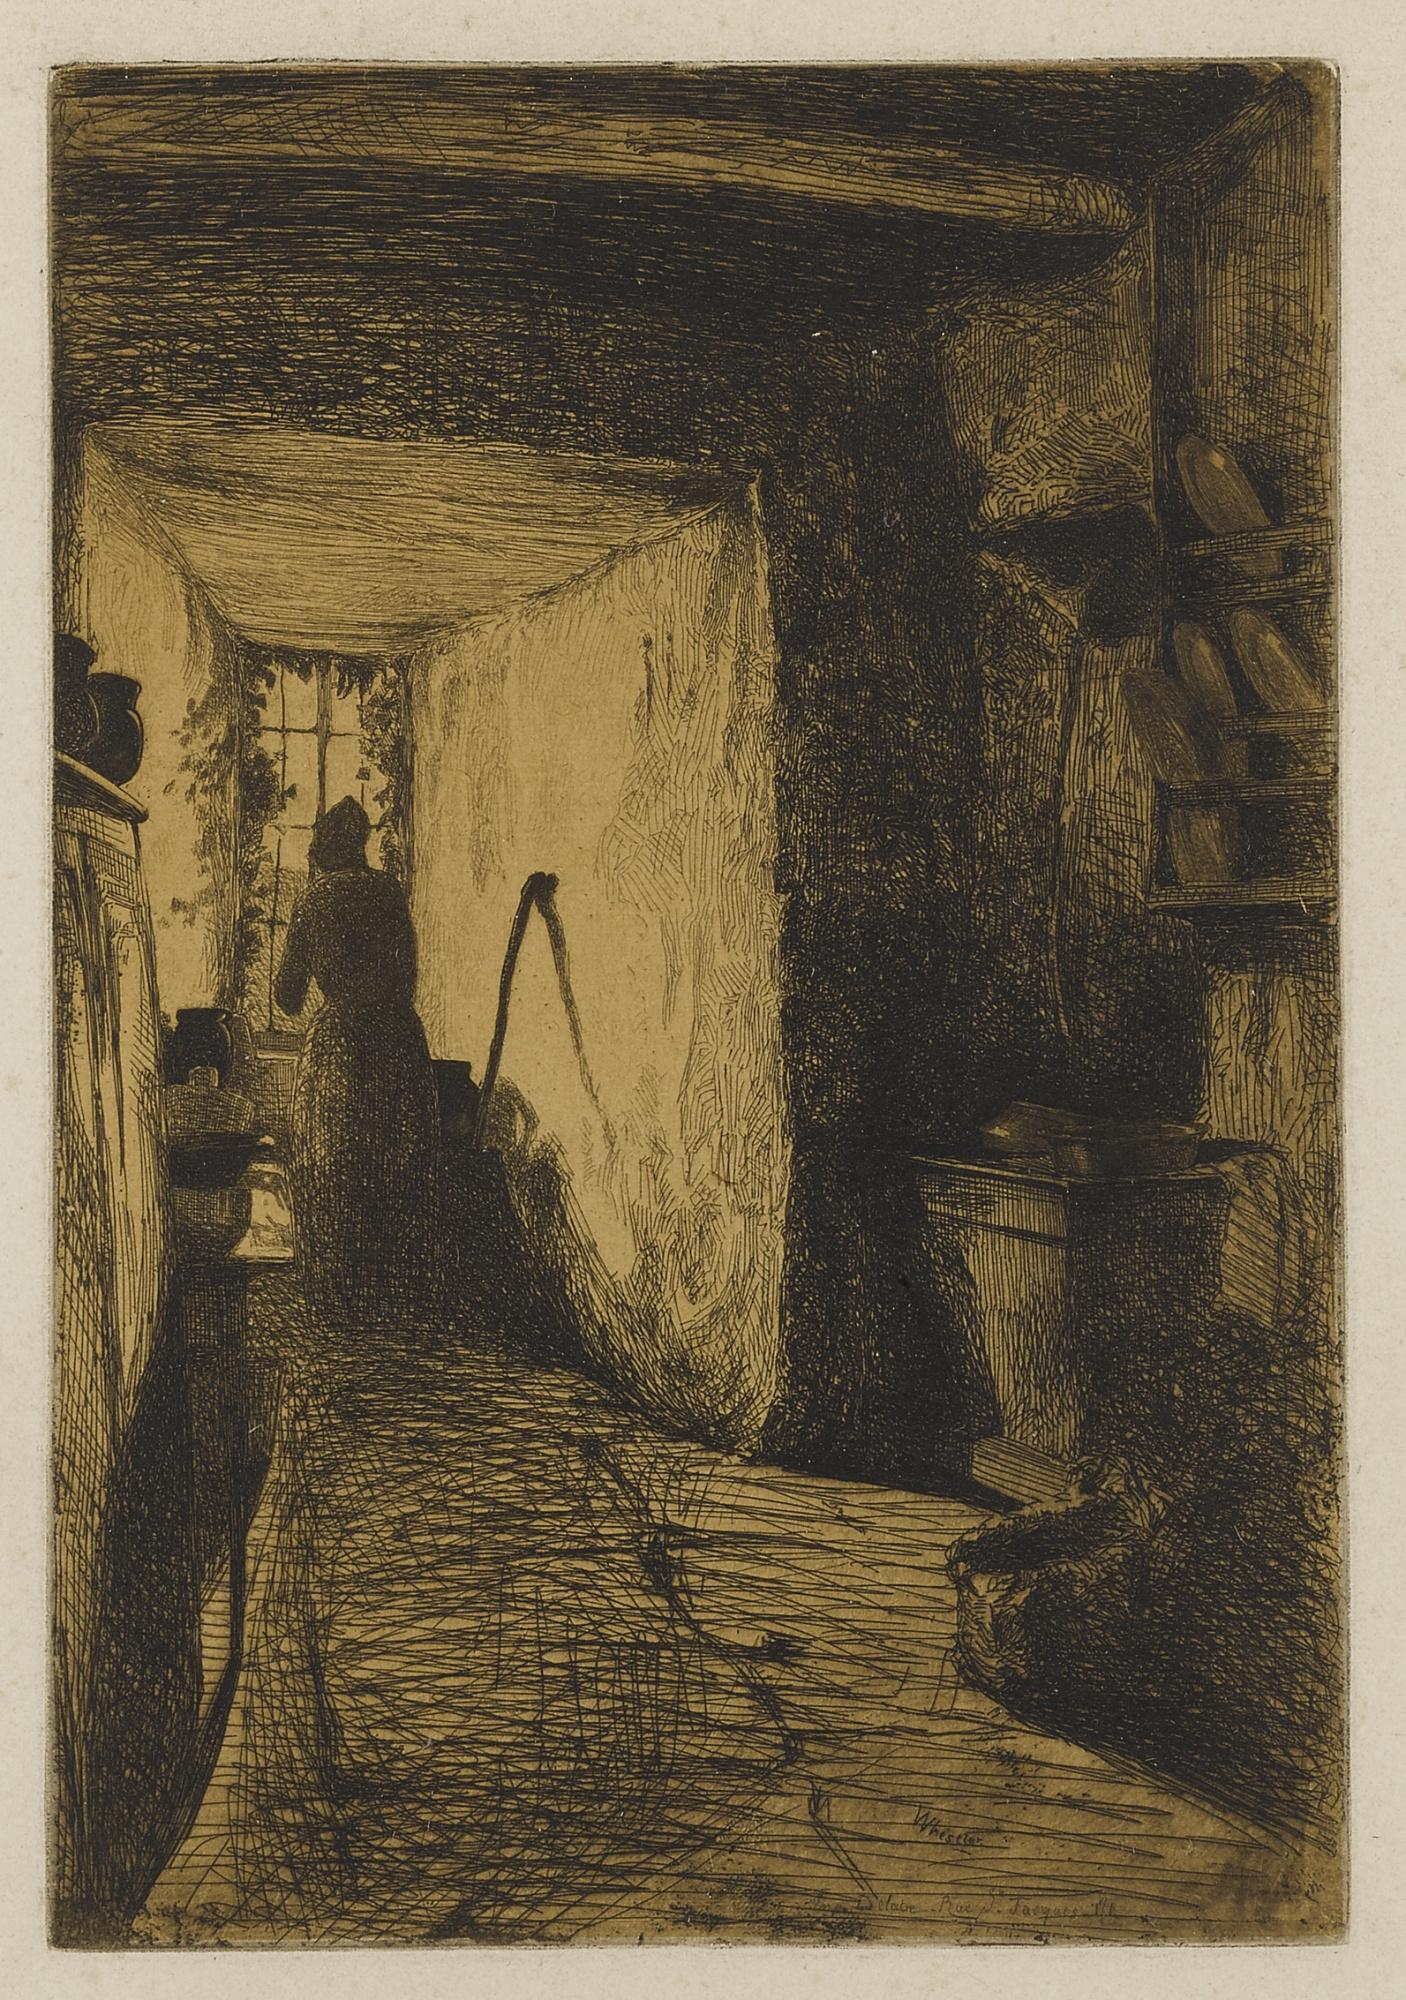 James Abbott McNeill Whistler-The Kitchen (K. 24; G. 16)-1858